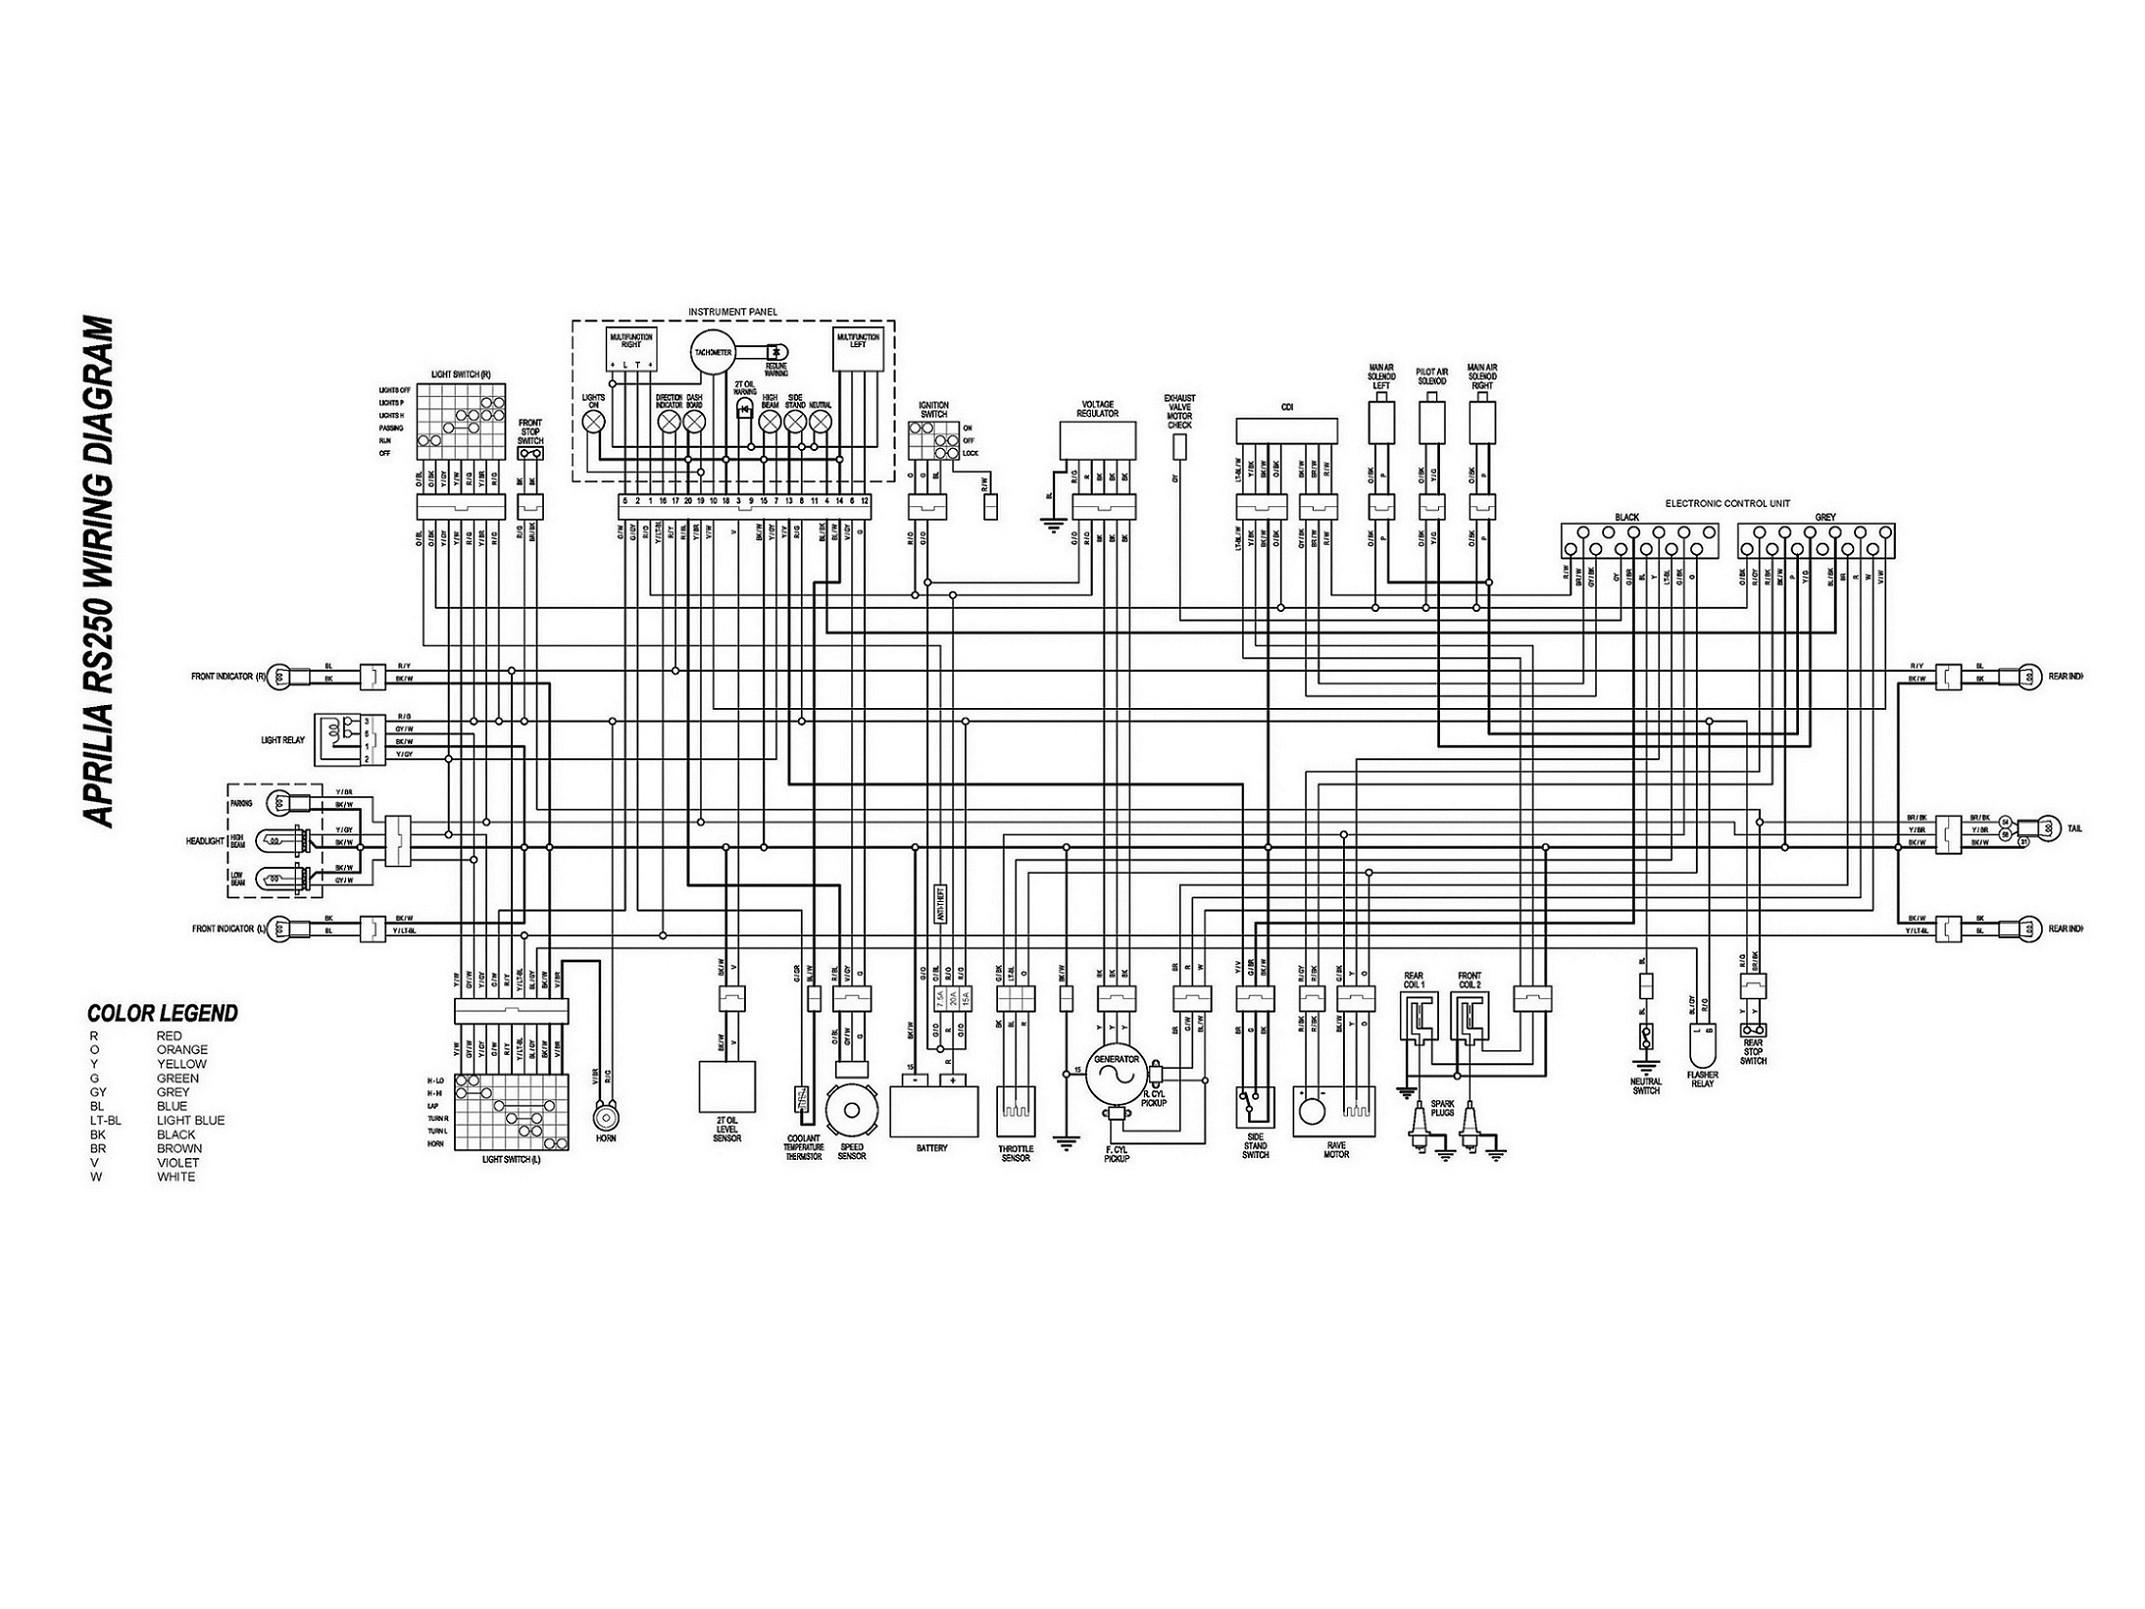 Aprilia Rs 125 Engine Diagram Rs250 Wiring Diagram Of Aprilia Rs 125 Engine Diagram